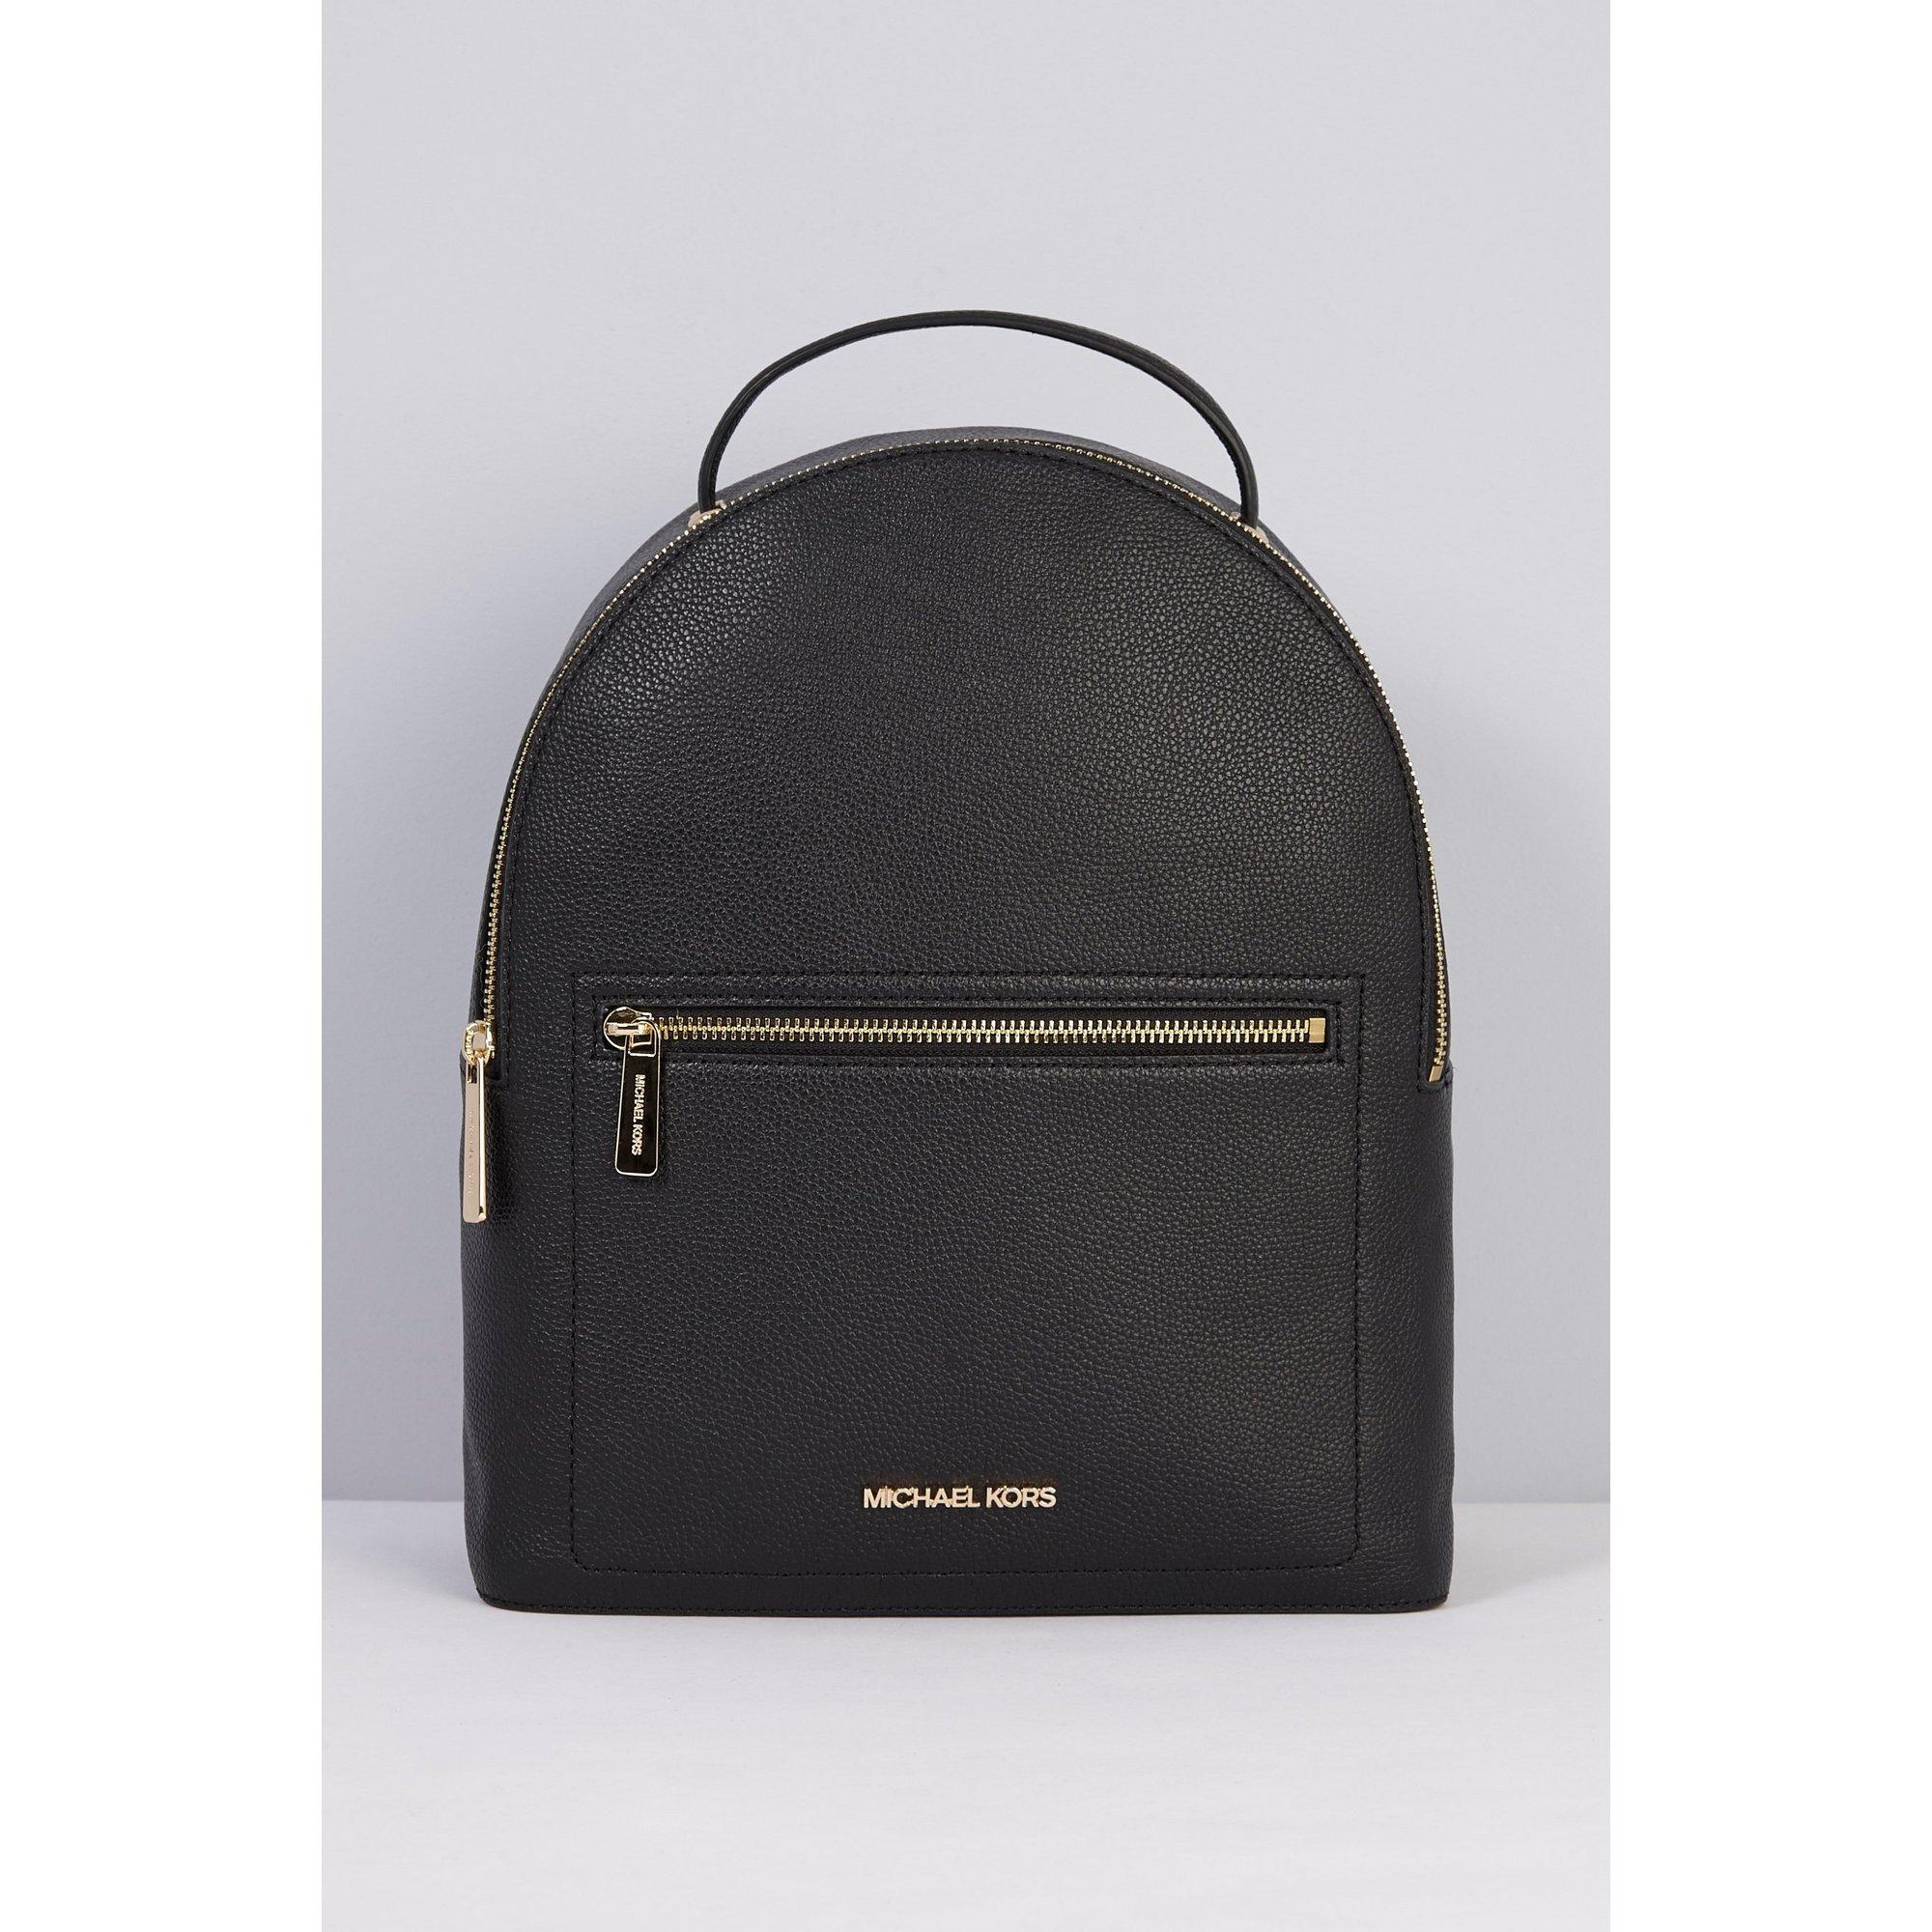 Image of Michael Kors Jessa Black Leather Backpack